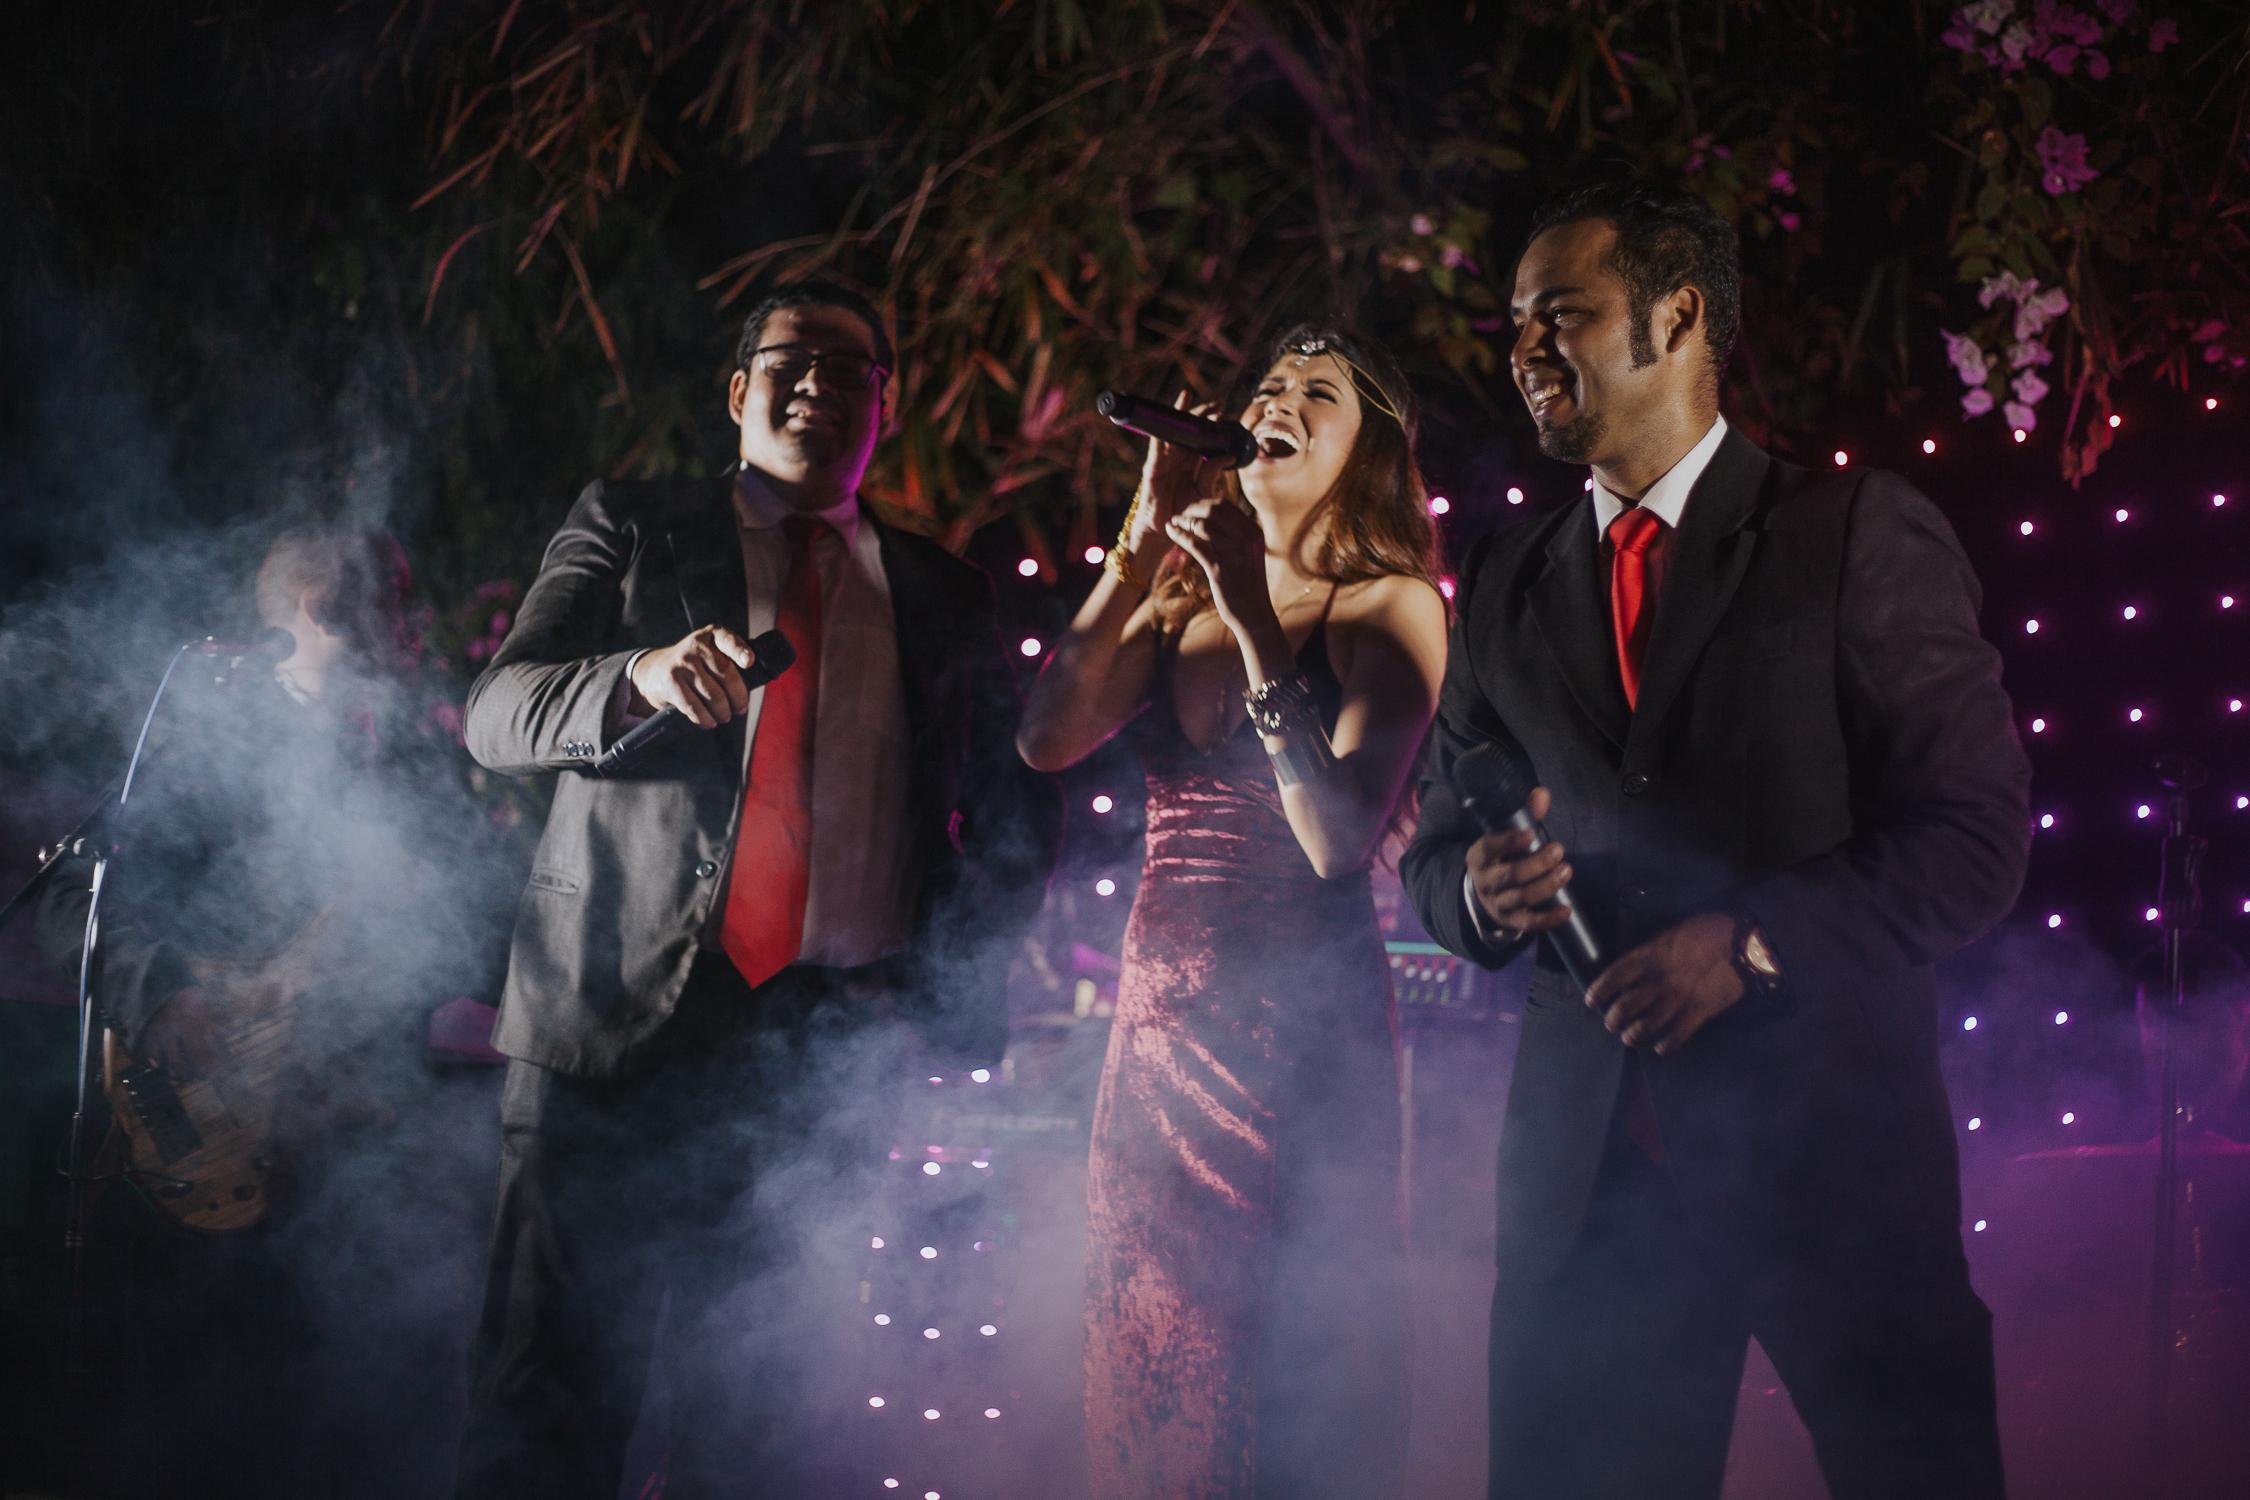 Michelle-Agurto-Fotografia-Bodas-Ecuador-Destination-Wedding-Photographer-Pauli-Edwin-35.JPG